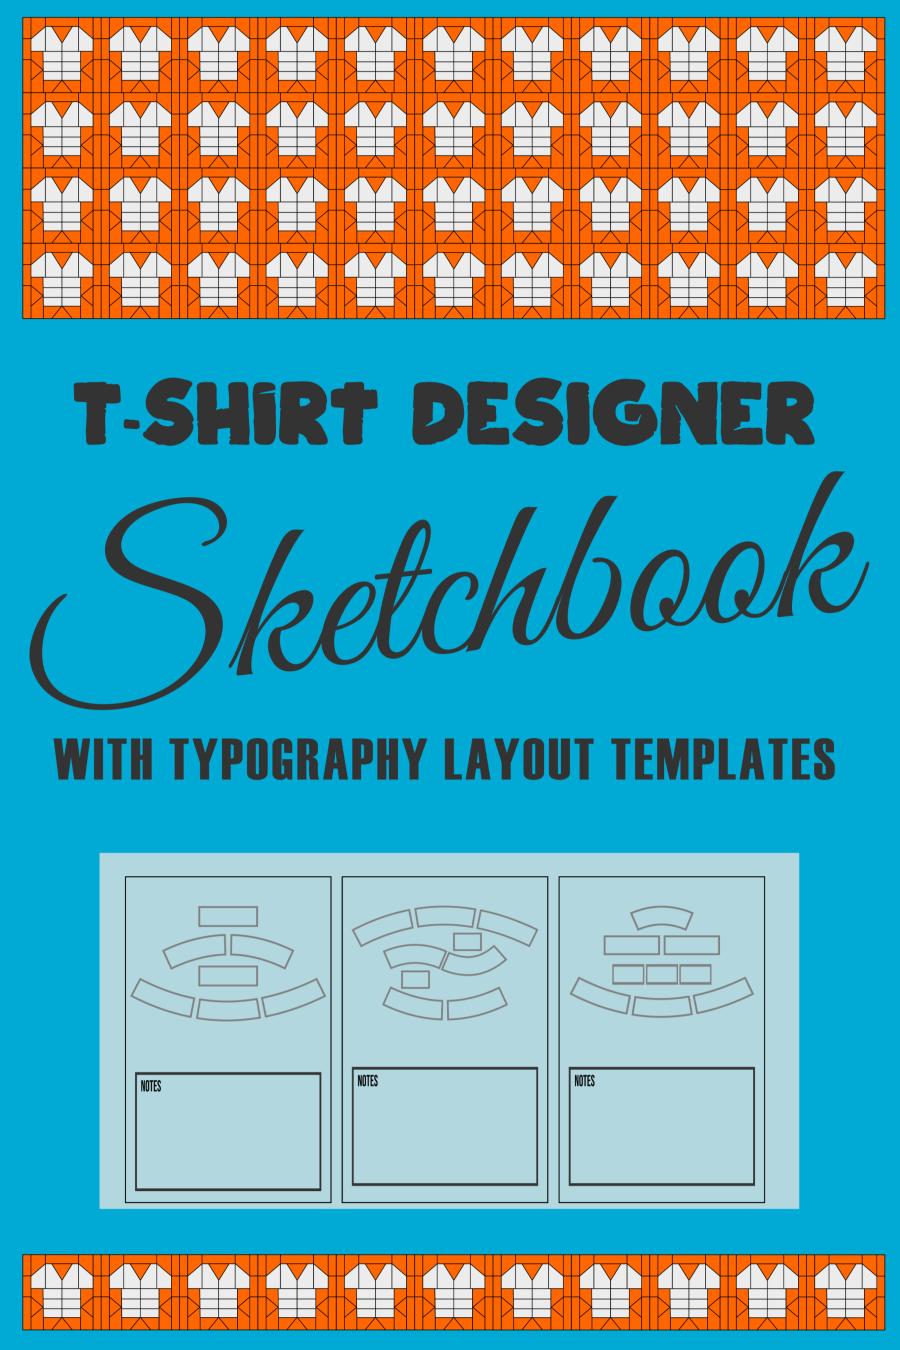 T Shirt Designer Typography Sketchbook In 2020 Sketch Book Shirt Designs Typography Sketchbooks